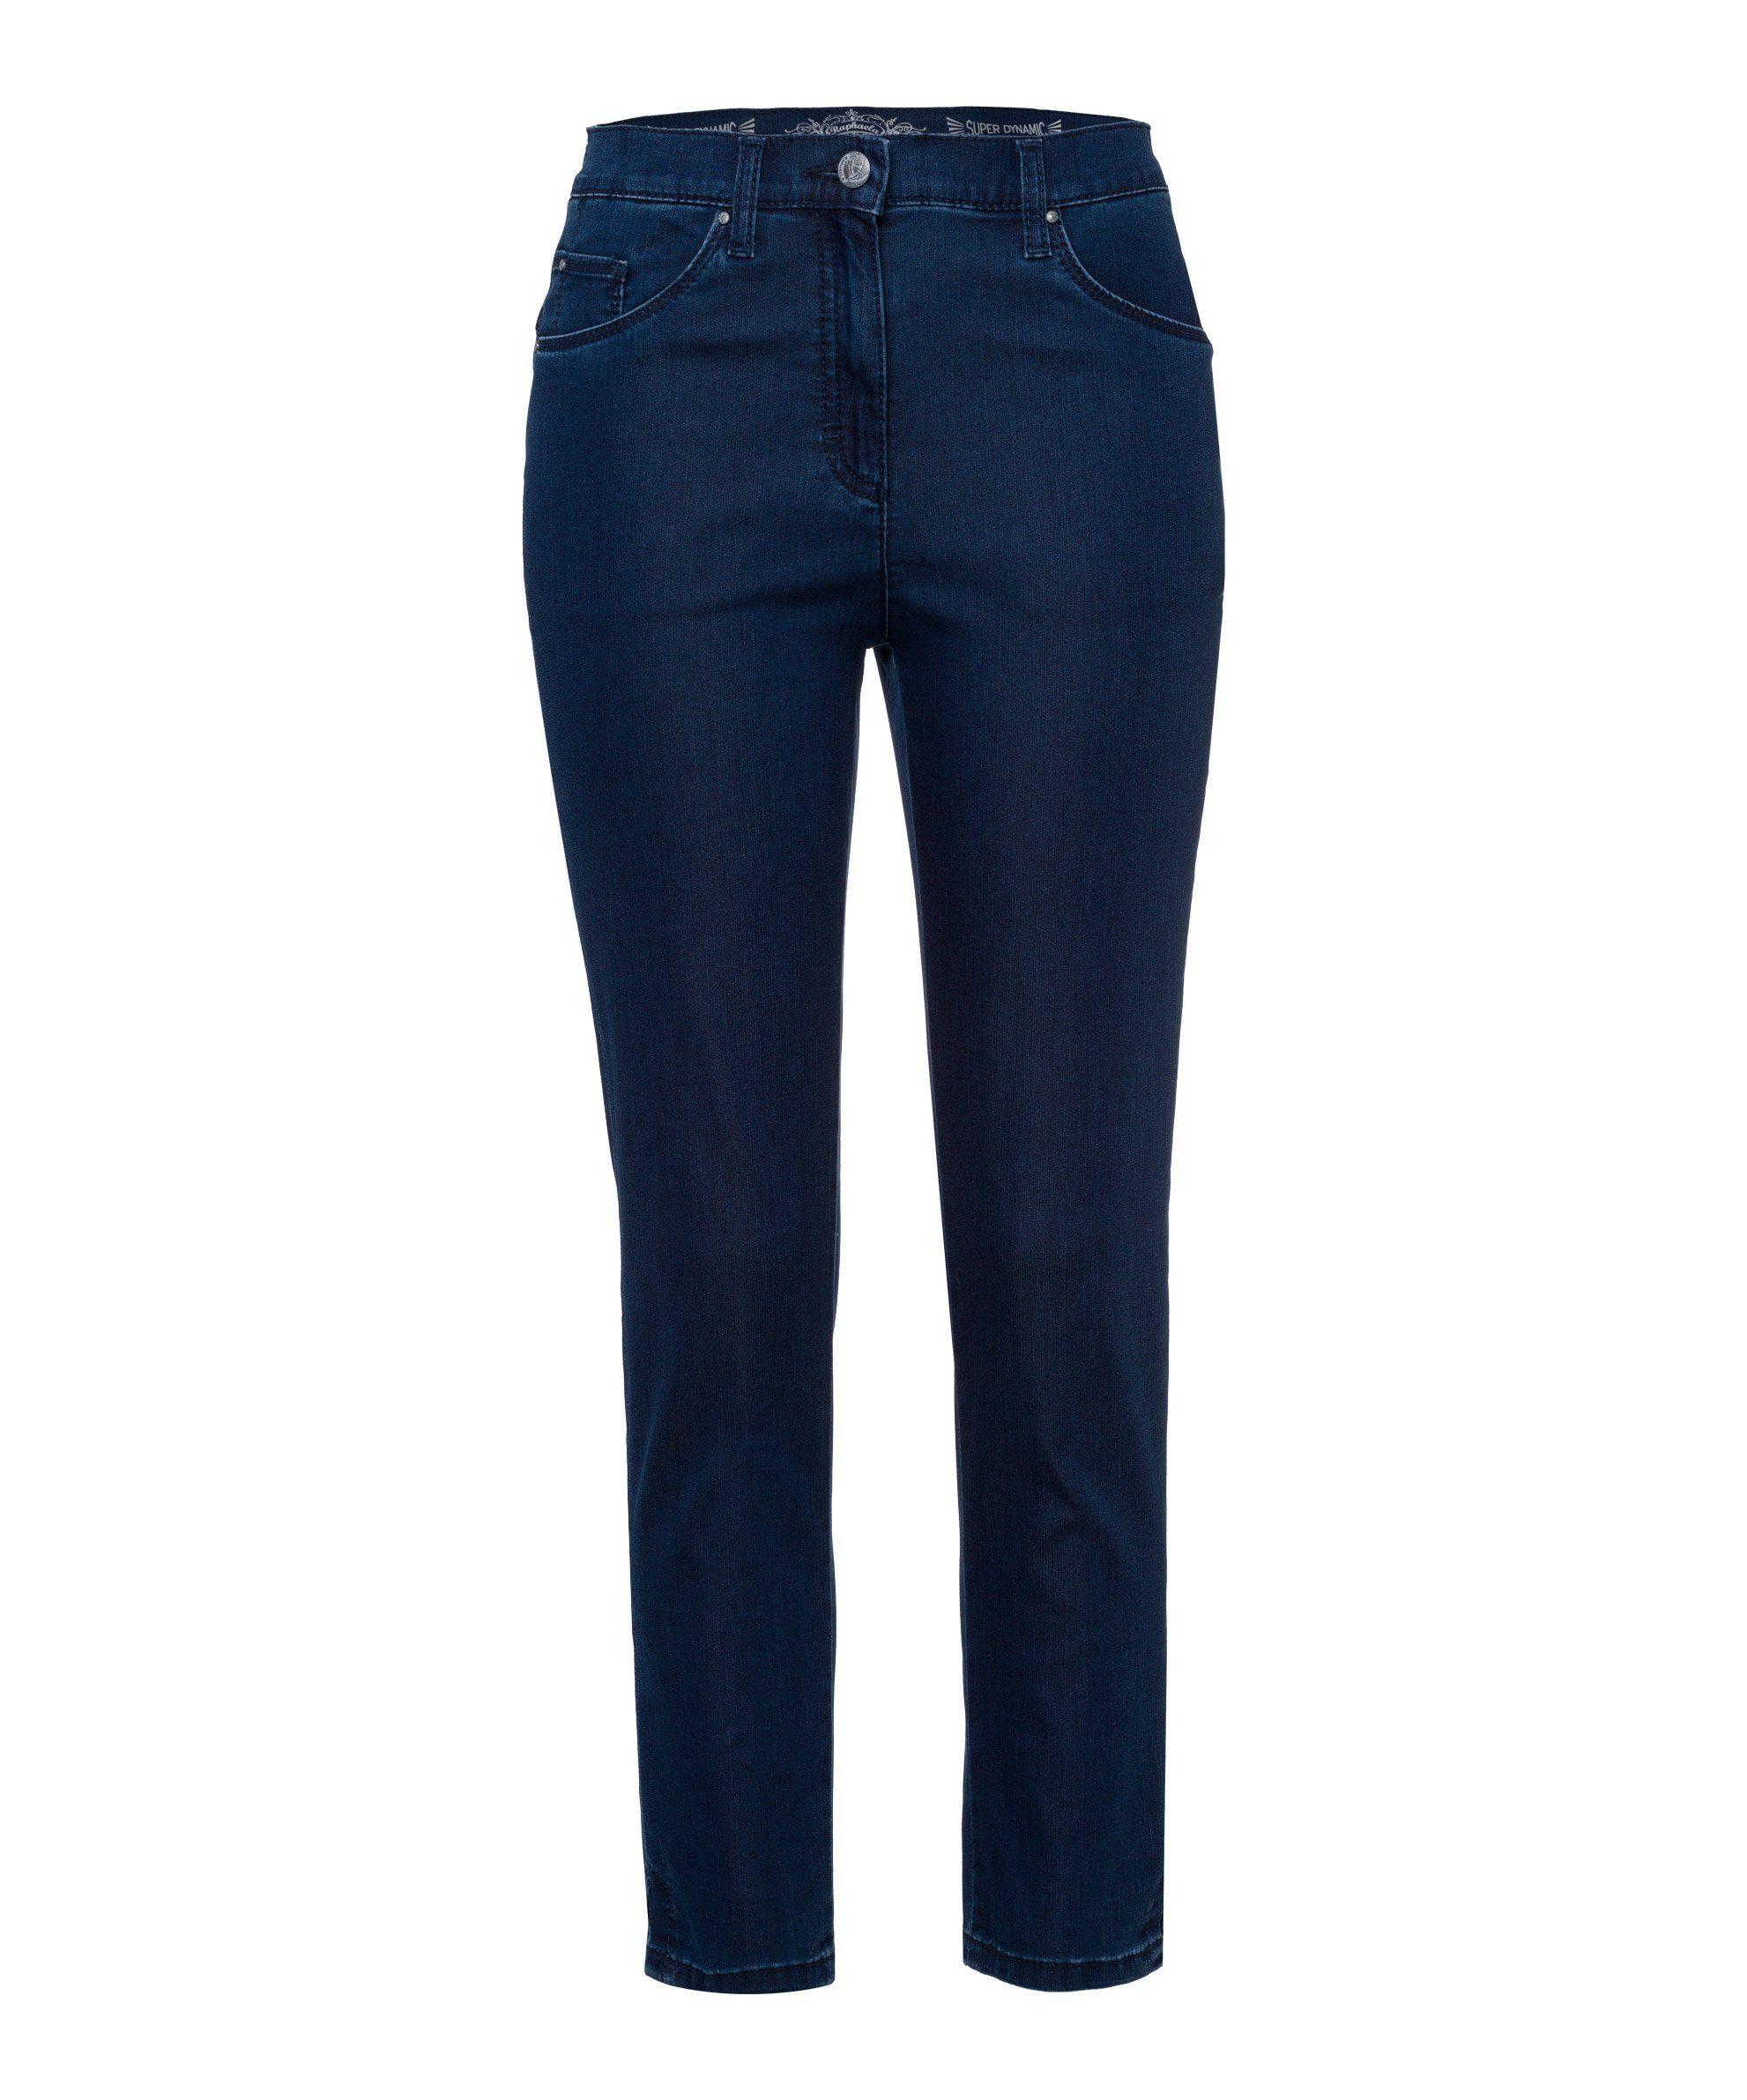 RAPHAELA by BRAX 5-Pocket-Jeans »Style Lesley S«